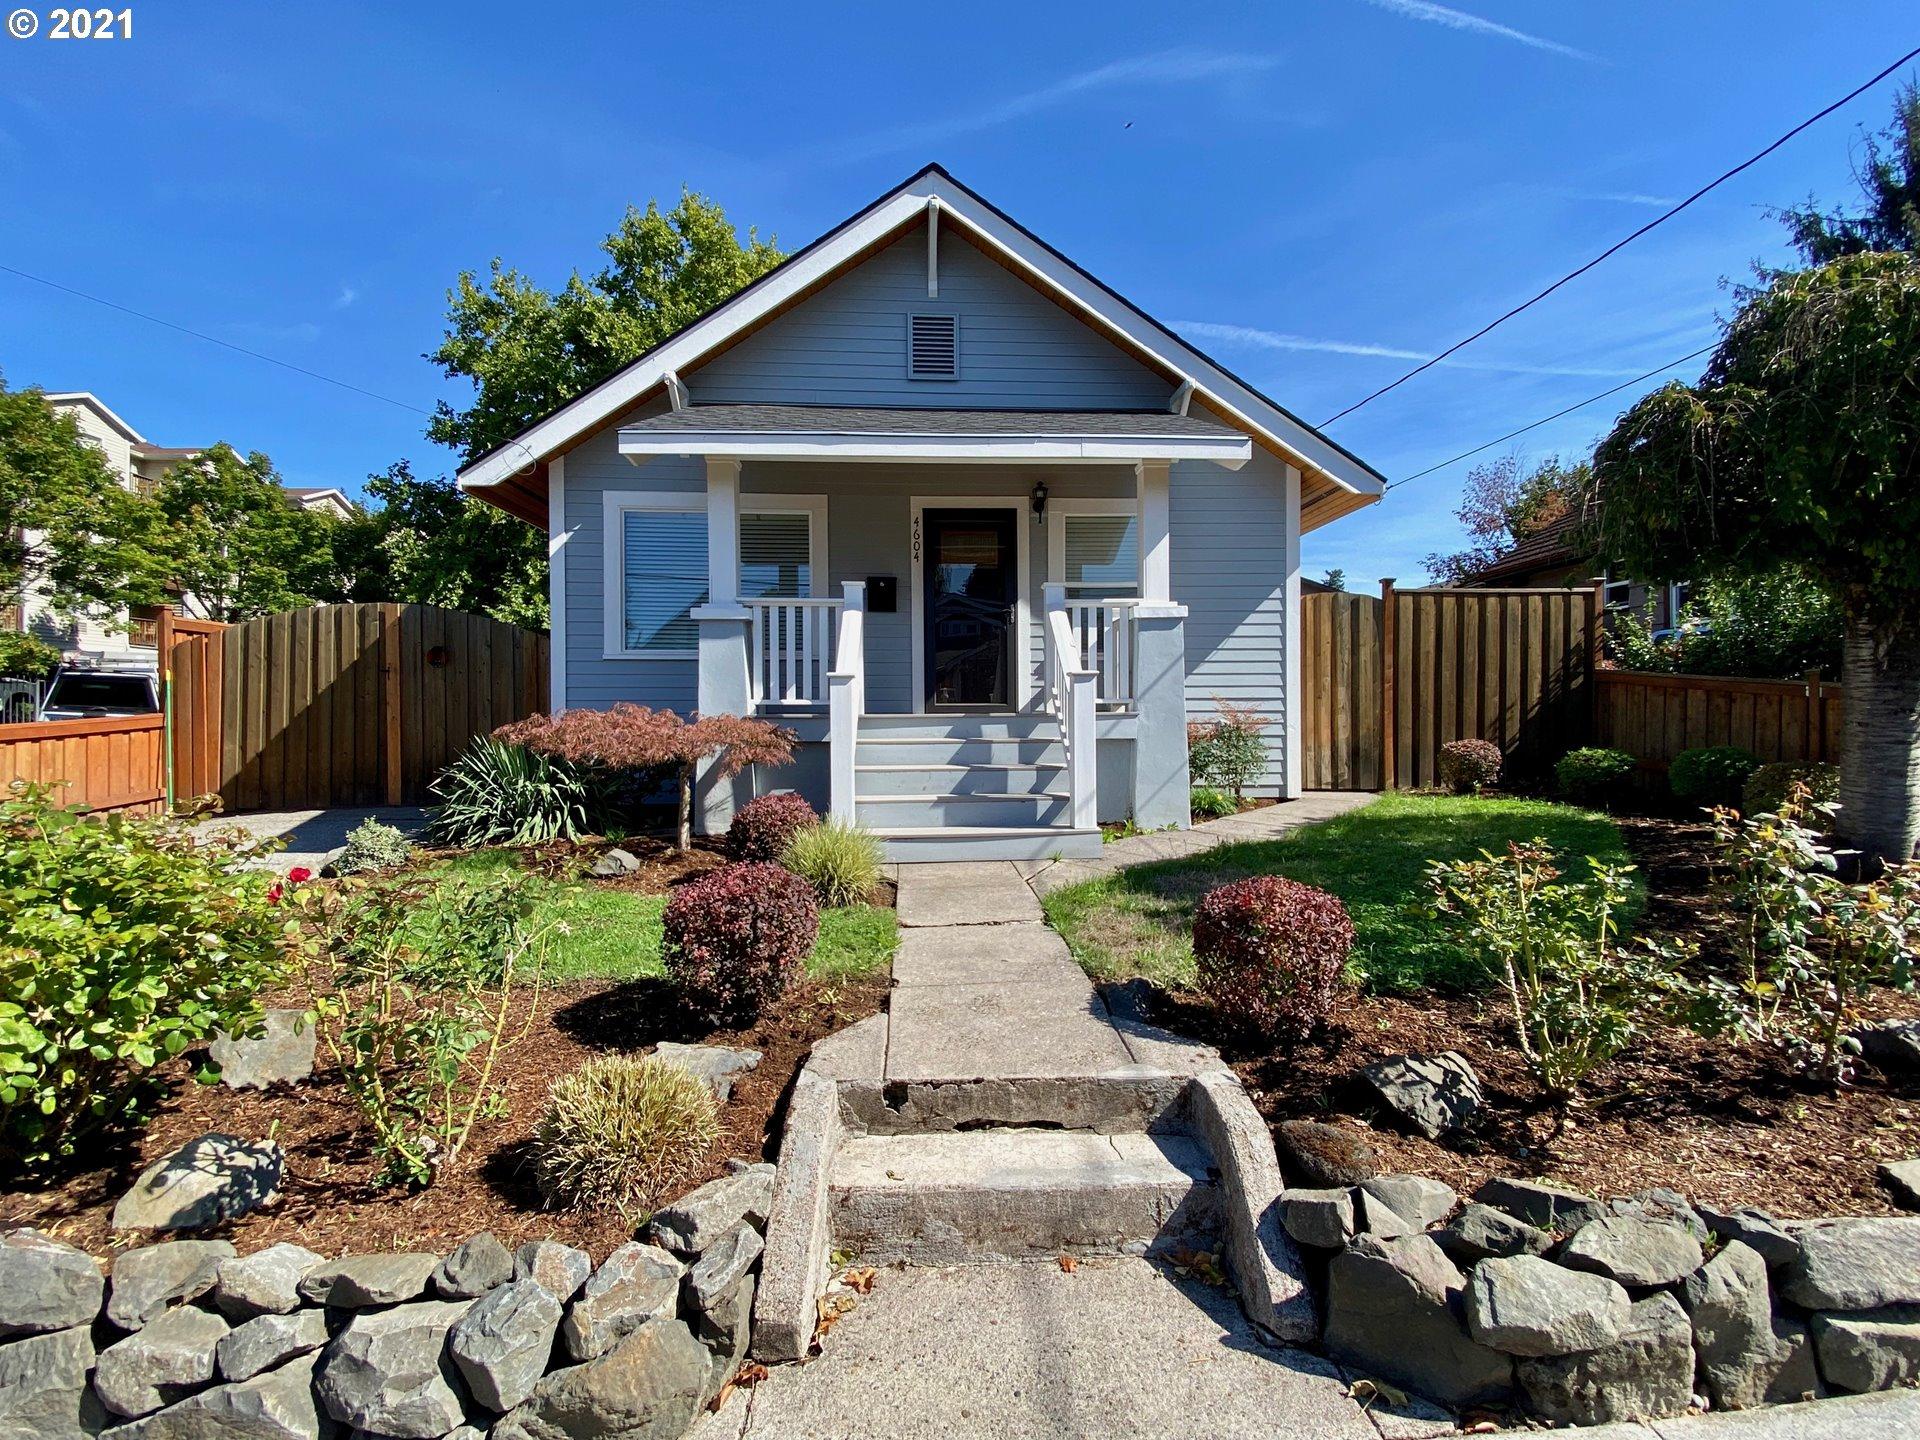 4604 SE 30TH AVE, Portland OR 97202